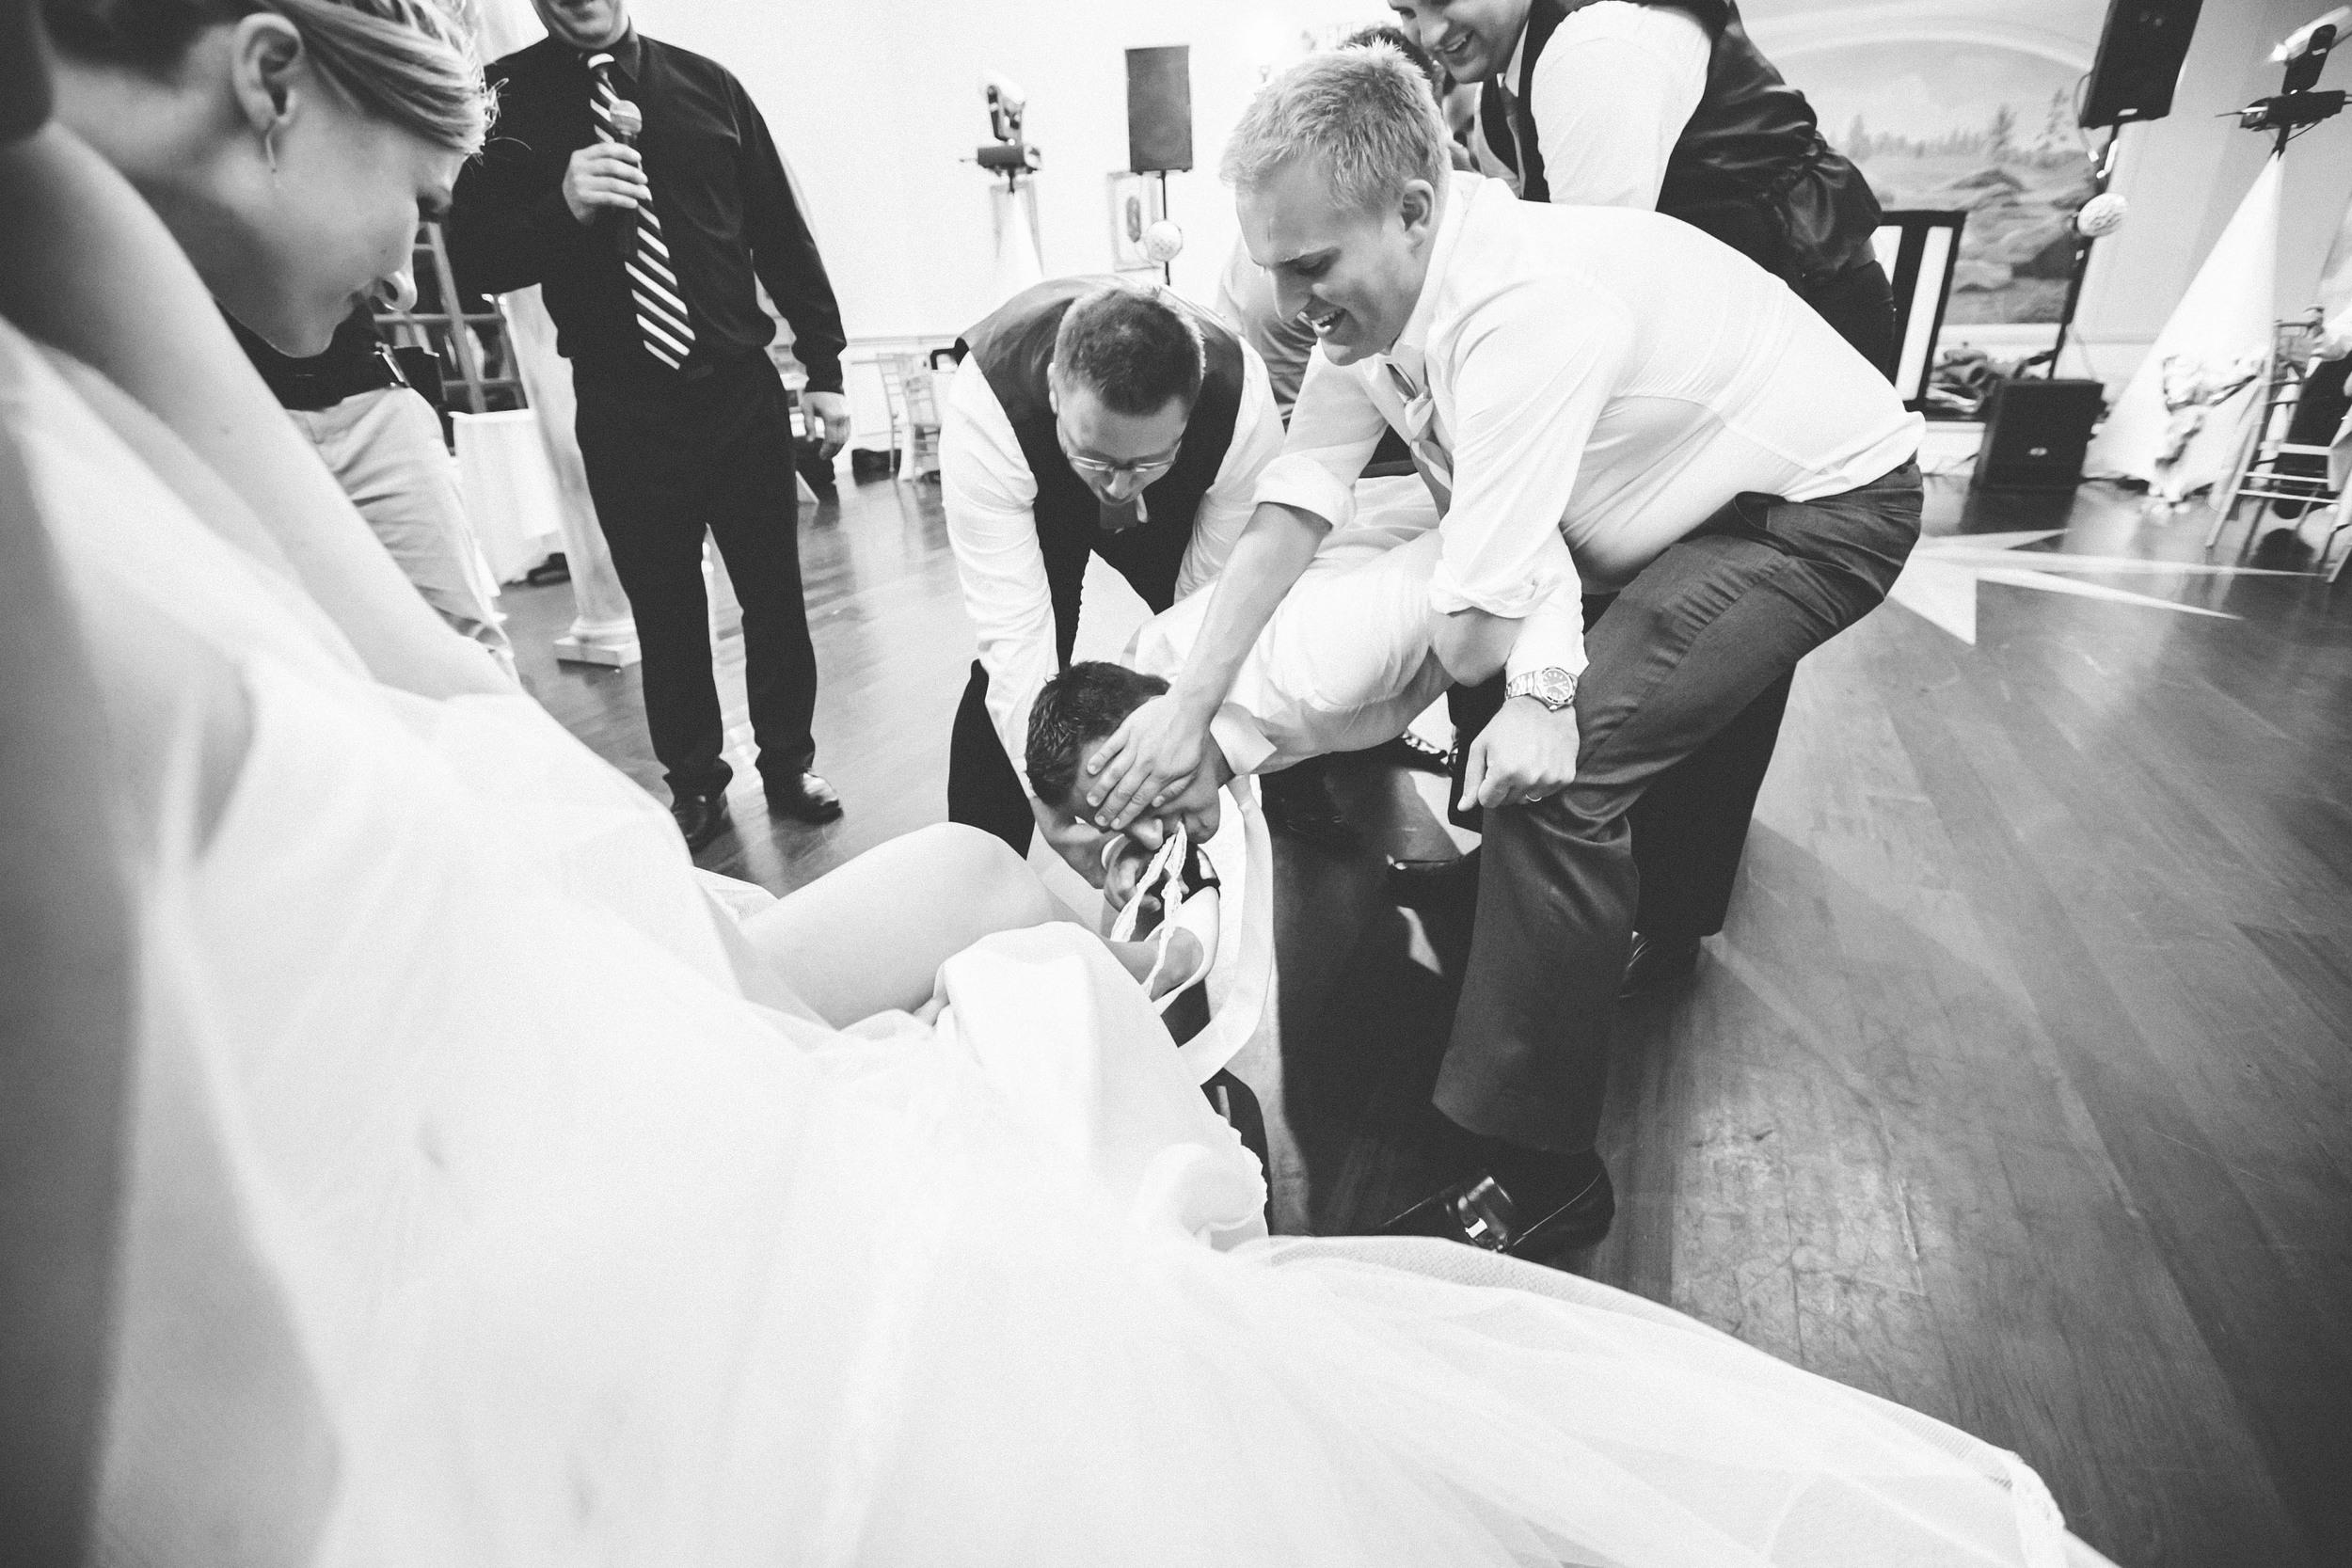 Connecticut-Photojournalistic-Wedding-Photography-Jacek-Dolata-2.jpg